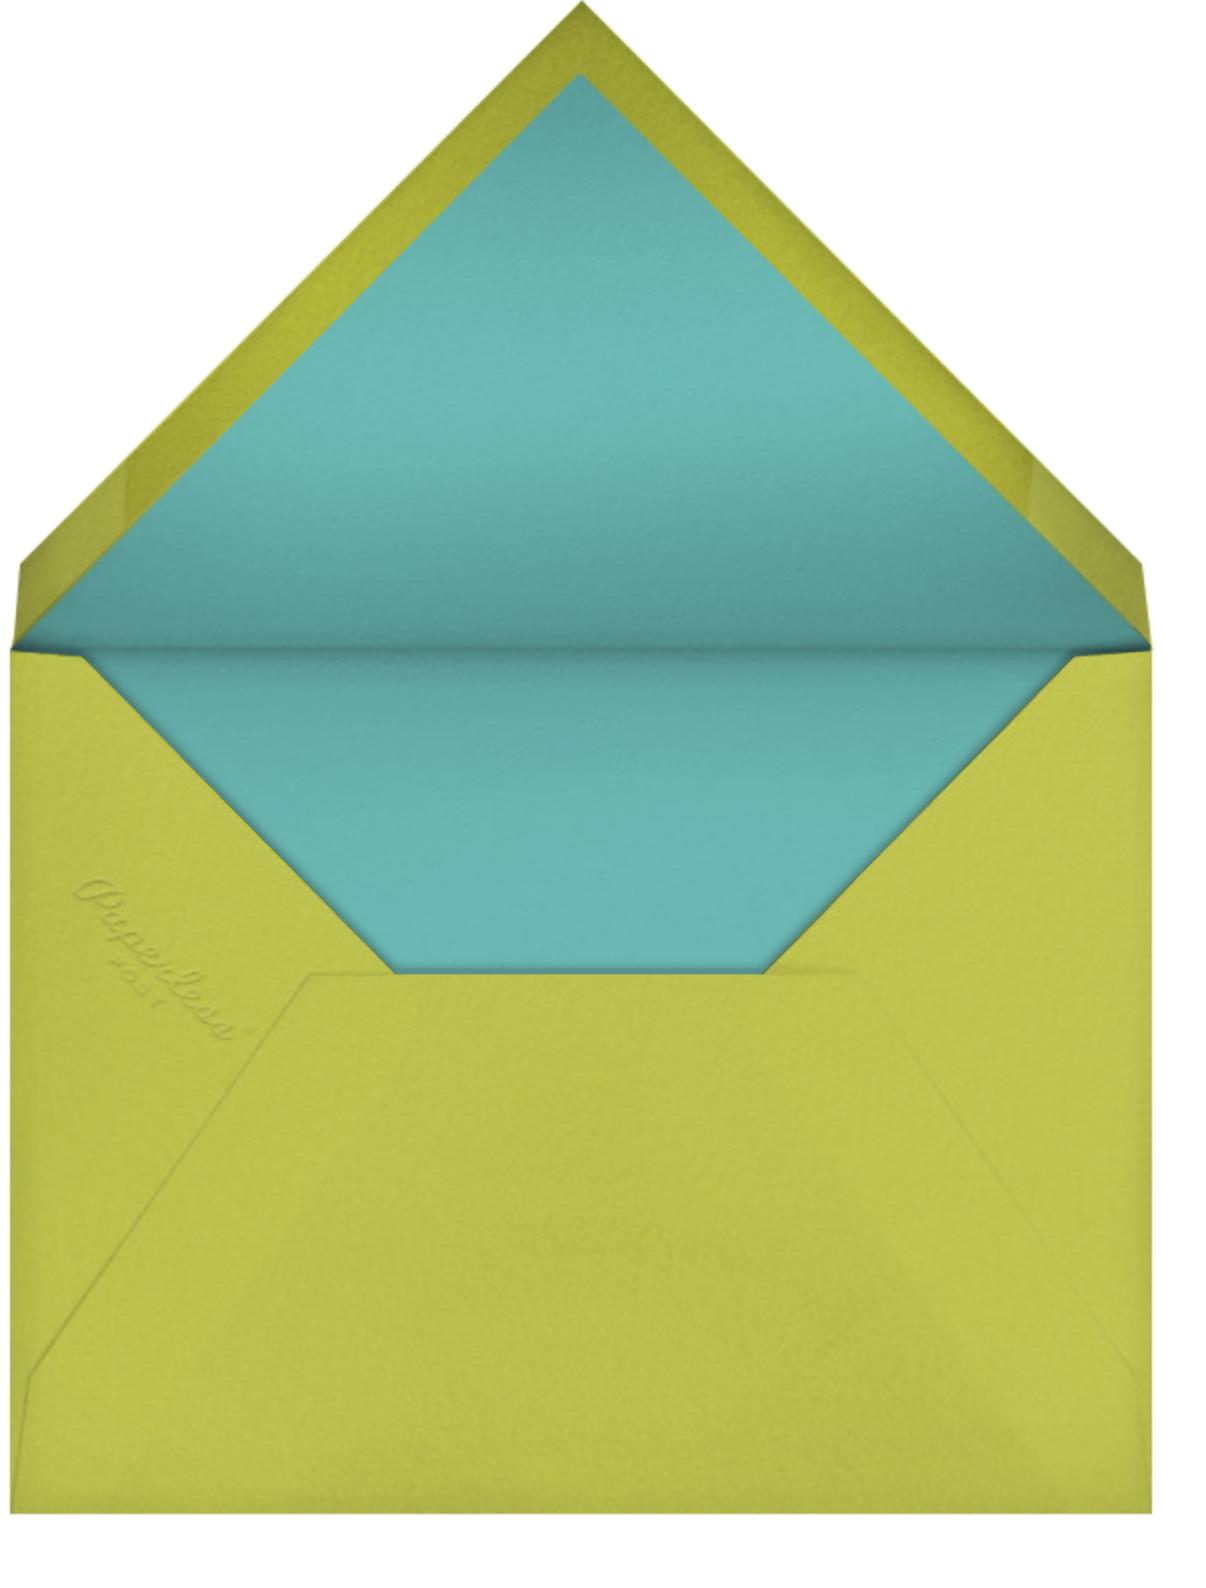 Acorn Supper - Petit Collage - Birth - envelope back